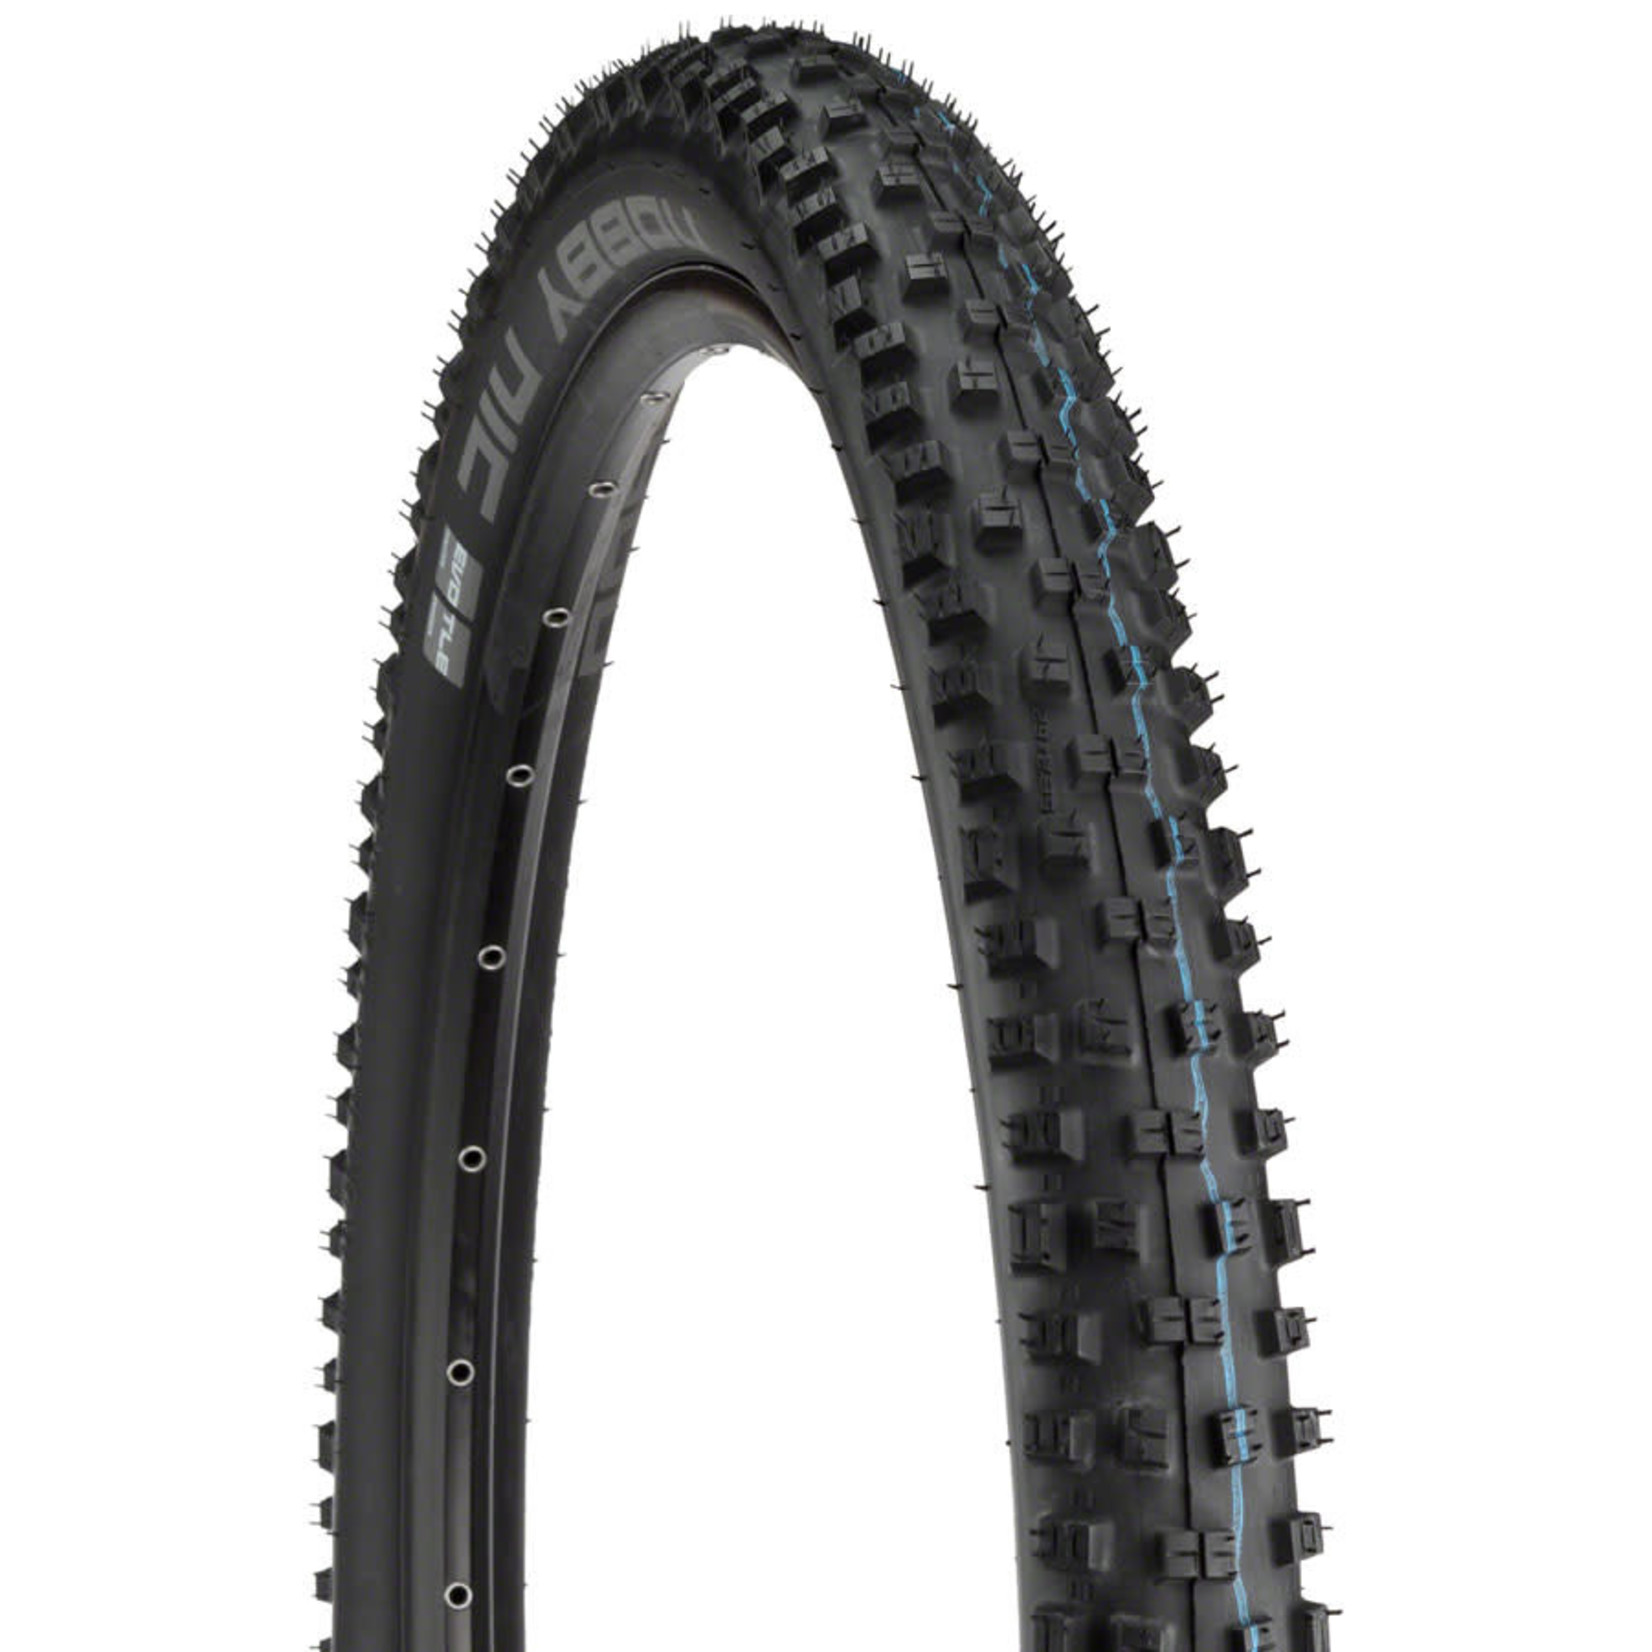 Schwalbe Schwalbe Nobby Nic Tubeless Easy SnakeSkin Tire, 29 x 2.35 EVO Folding Bead Black with Addix SpeedGrip Compound